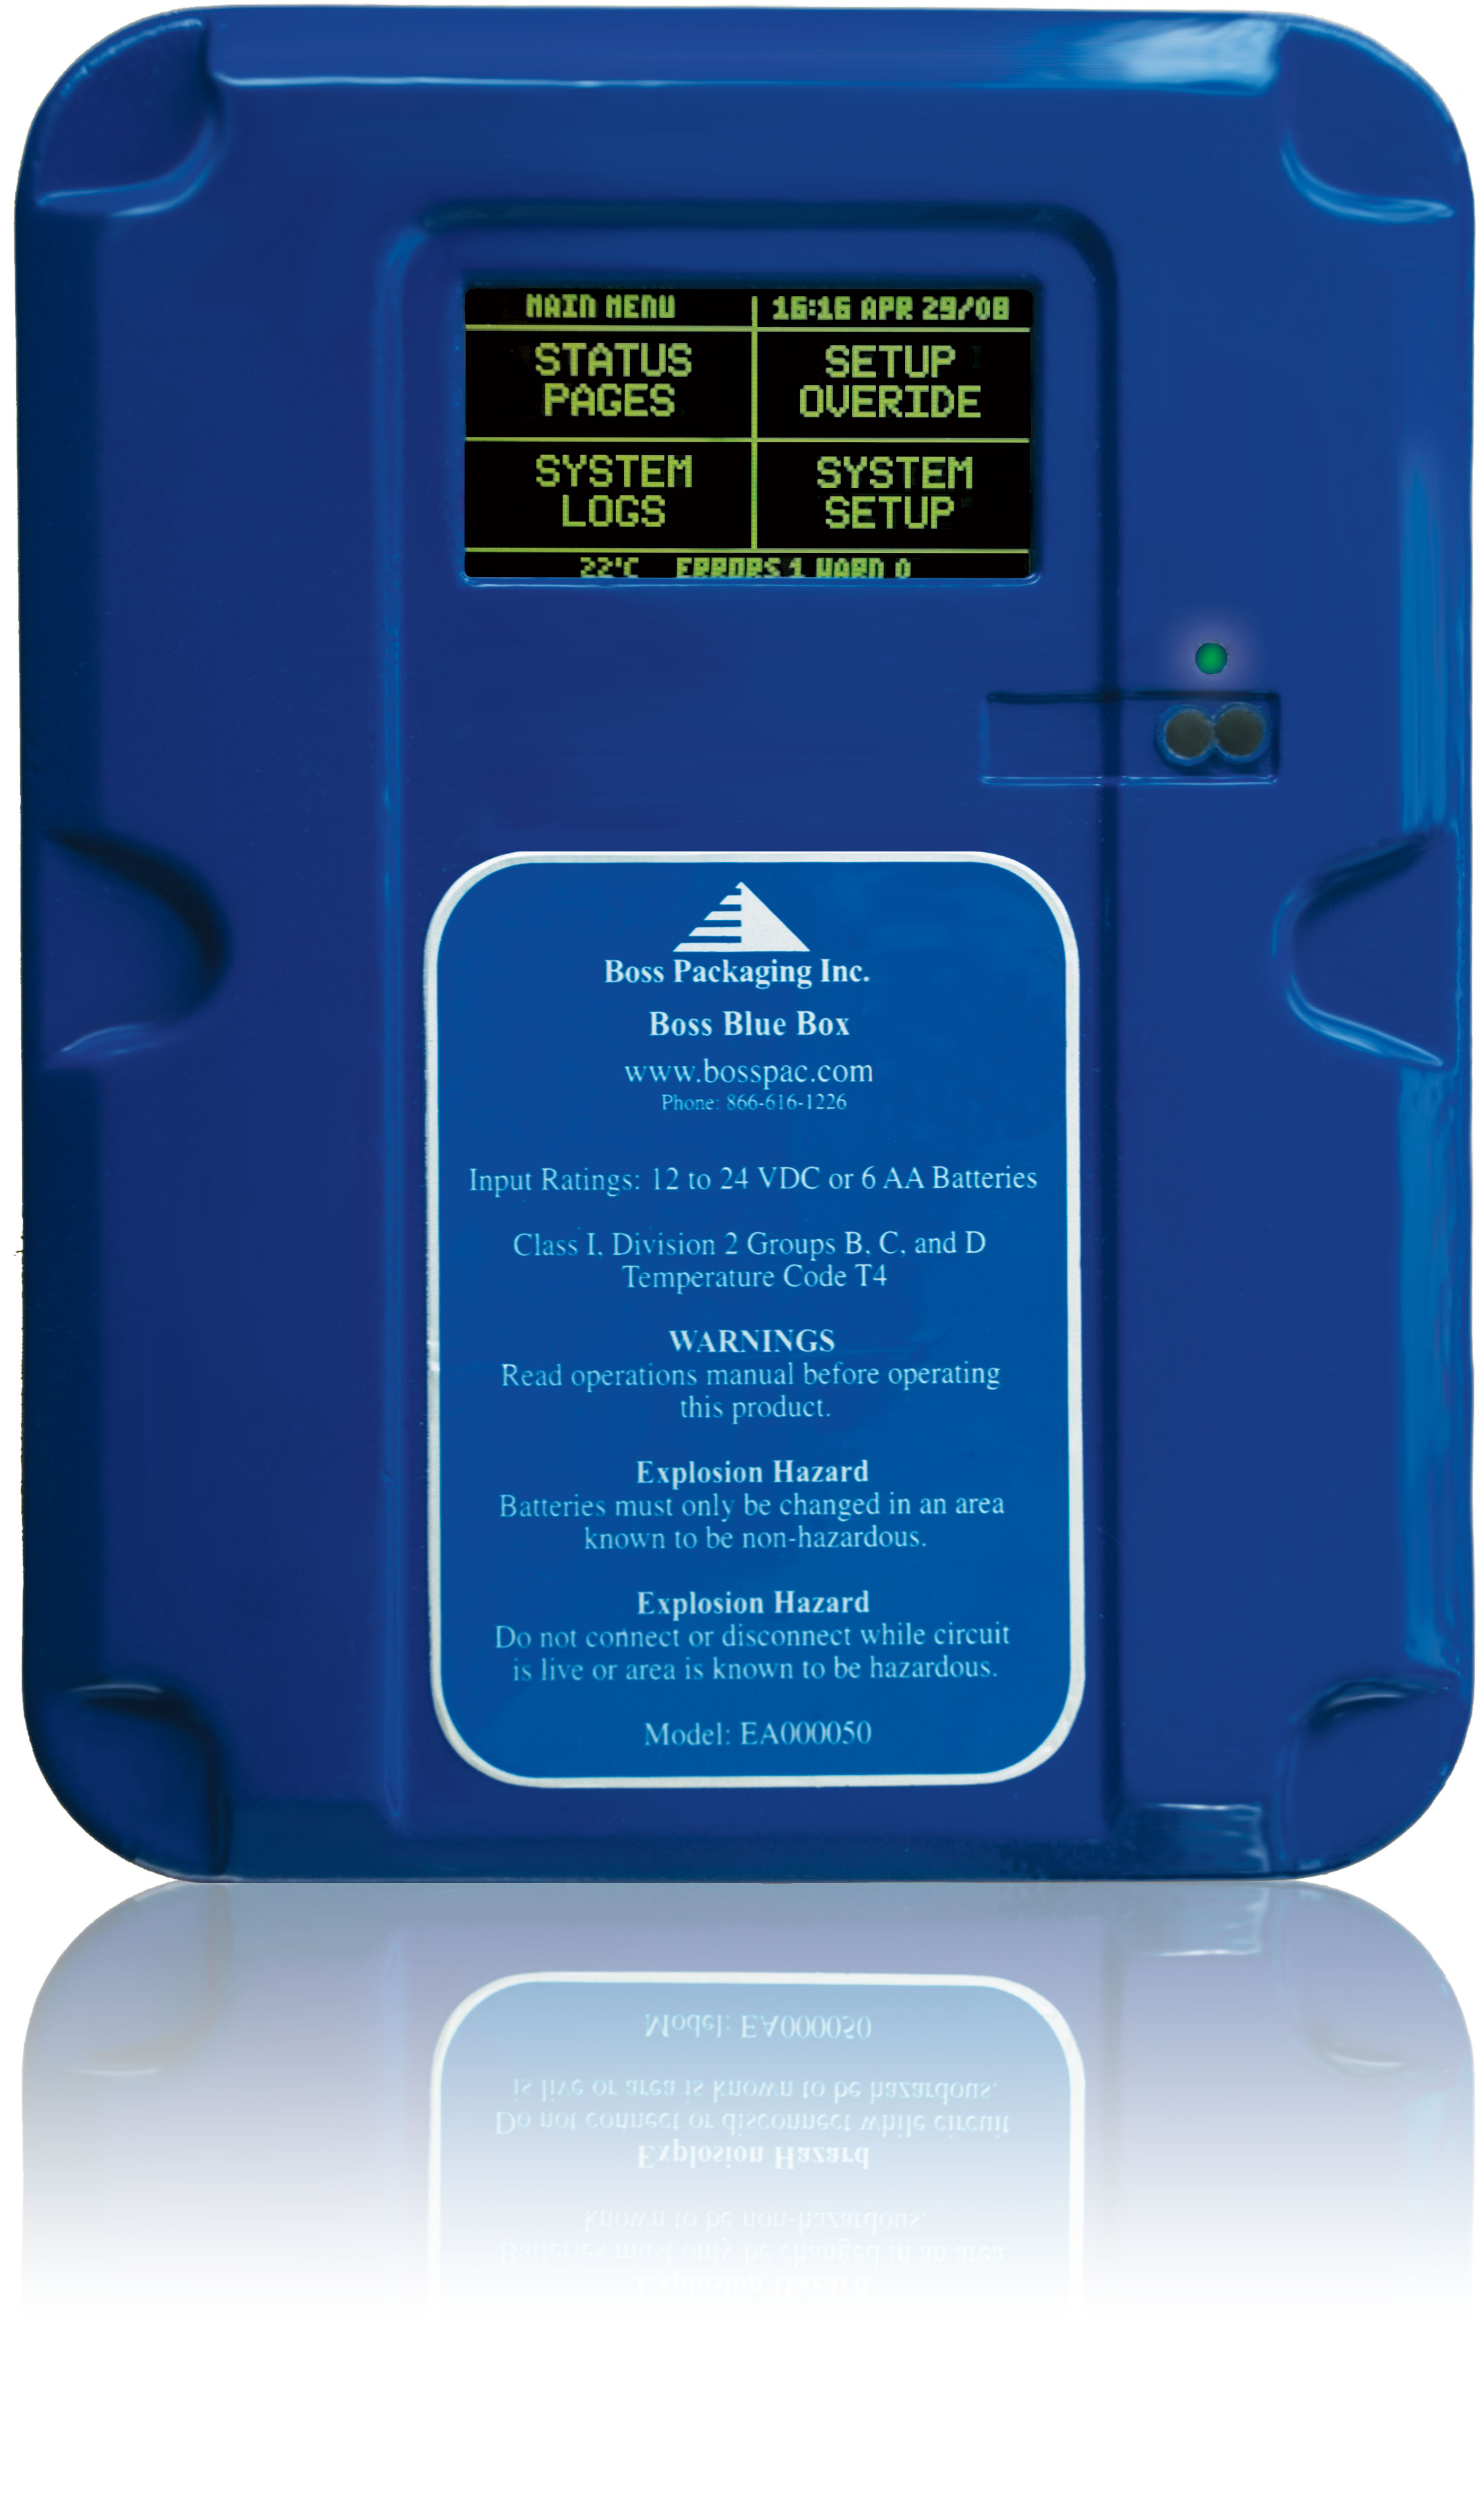 BossPac™ BlueBox Controller